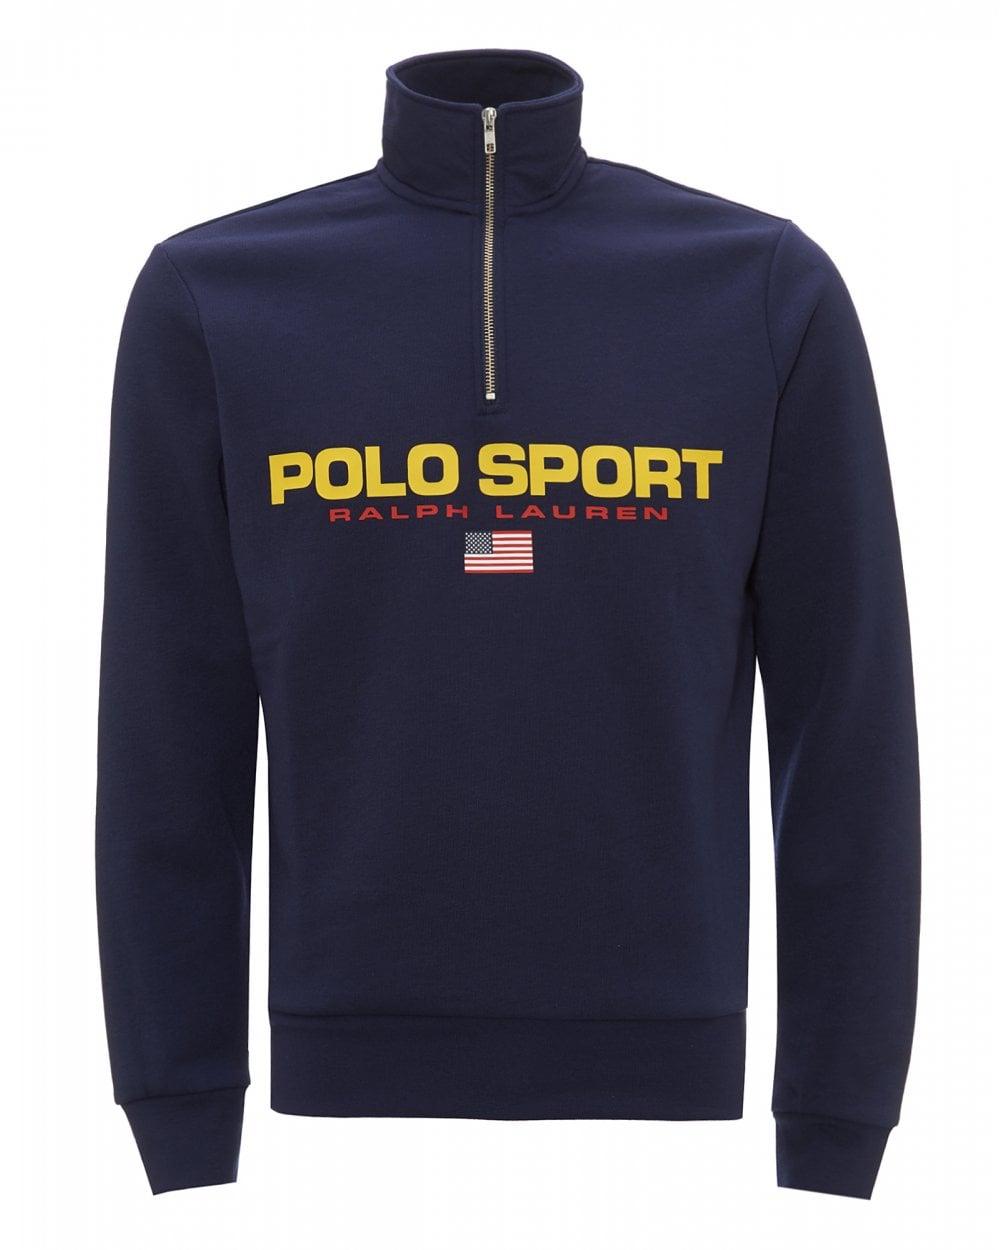 Mens Polo Sport Fleece Sweatshirt, Cruise Navy Sweat